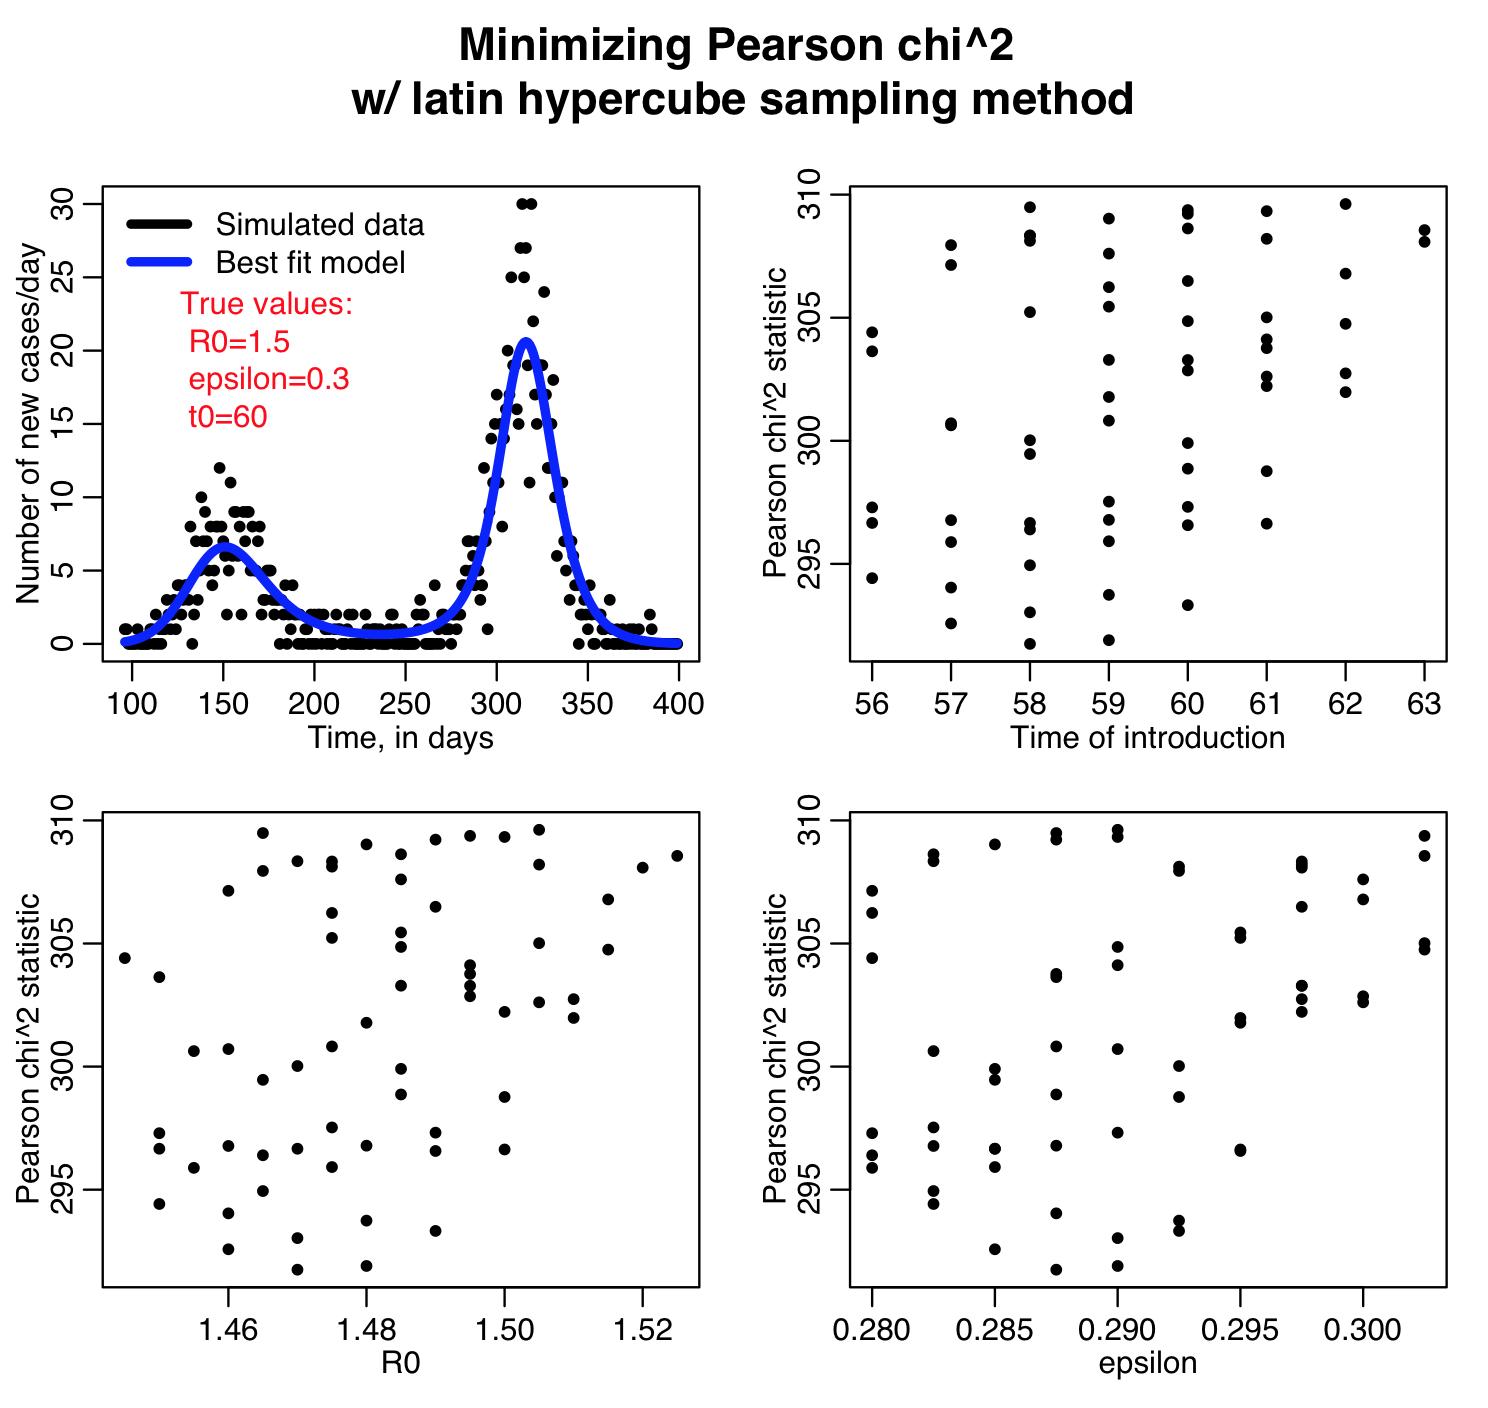 pearson_chisq_latin_hypercube_results